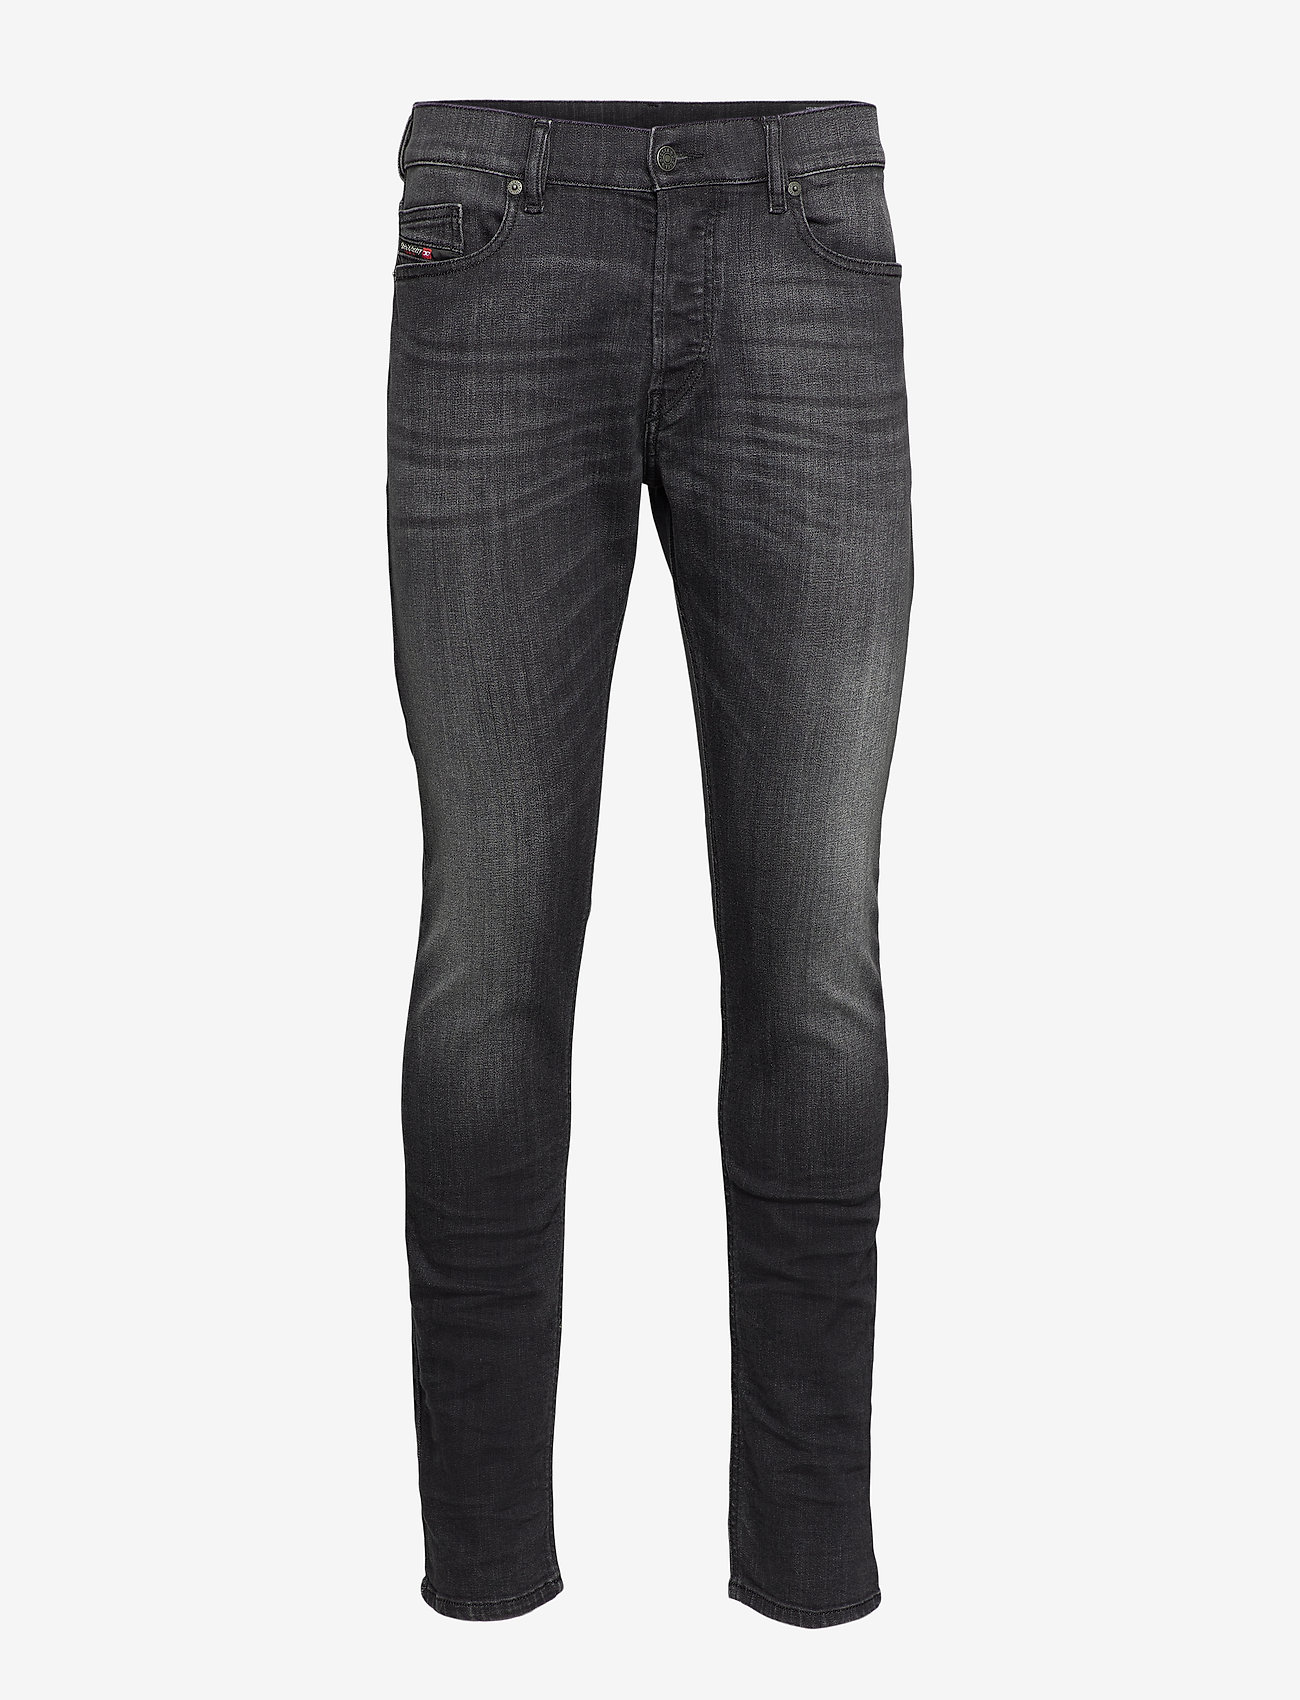 Diesel Men - D-LUSTER L.32 TROUSERS - slim jeans - camel - 0